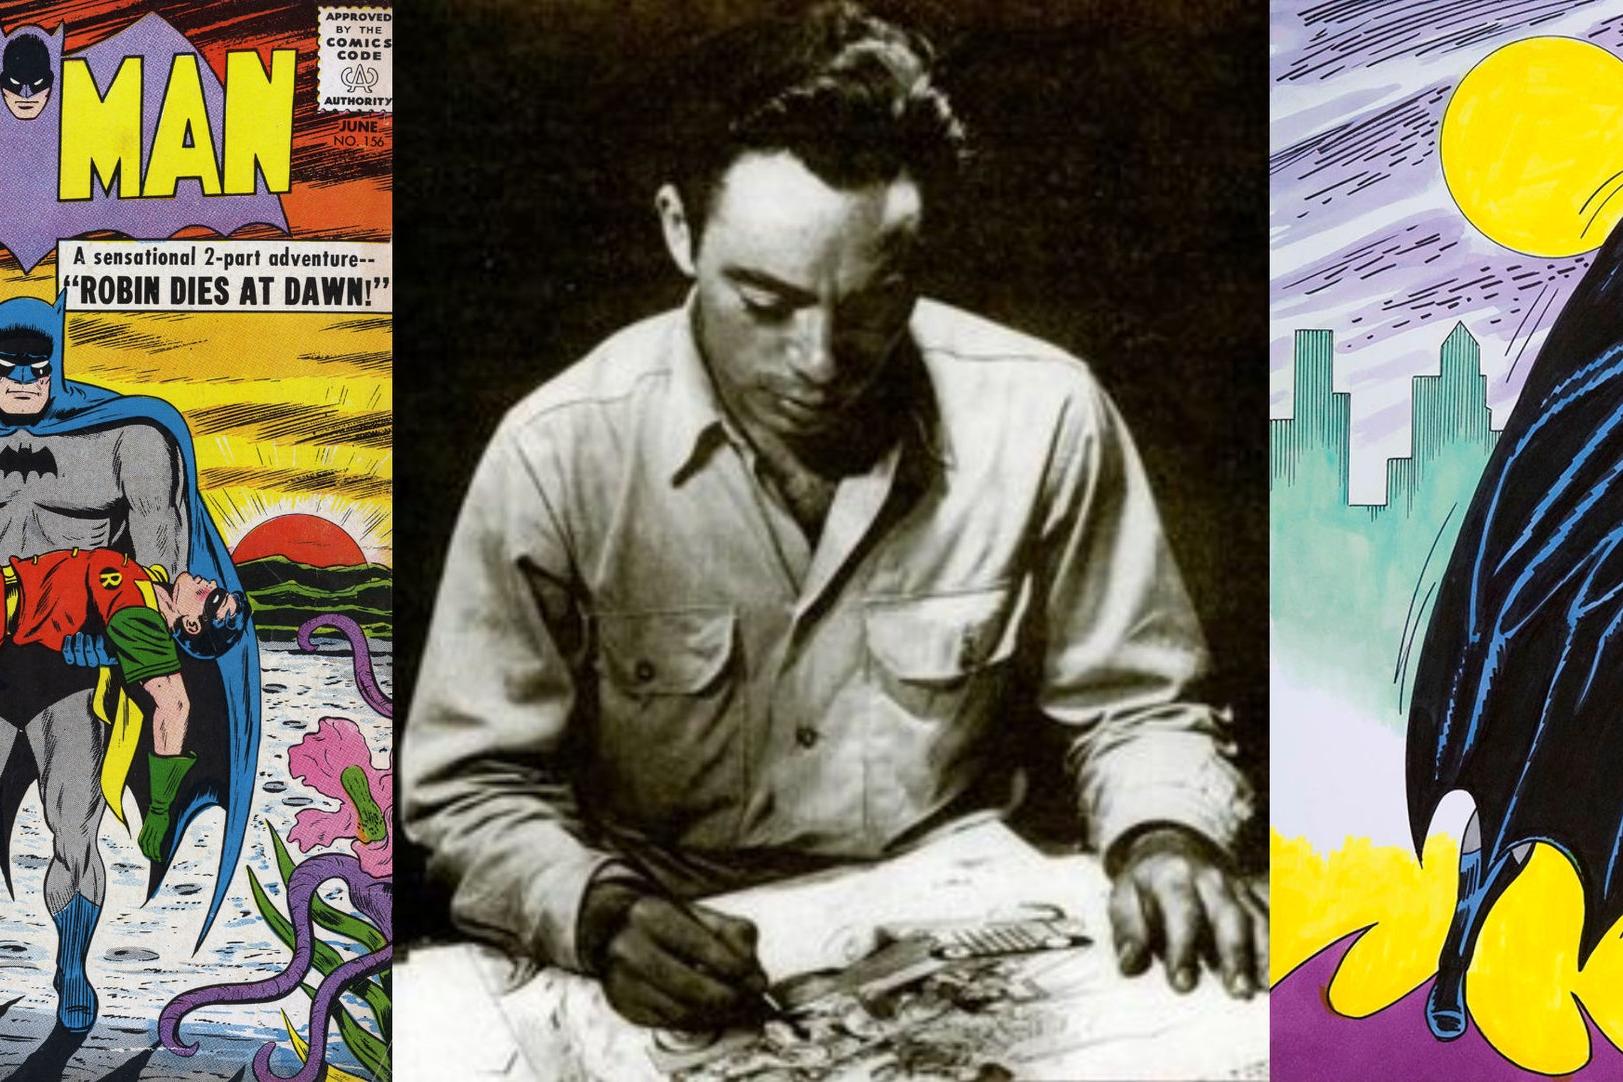 An Interview With Sheldon Moldoff - The Prolific Penciller Behind Early Batman   Written by Bryan Stroud